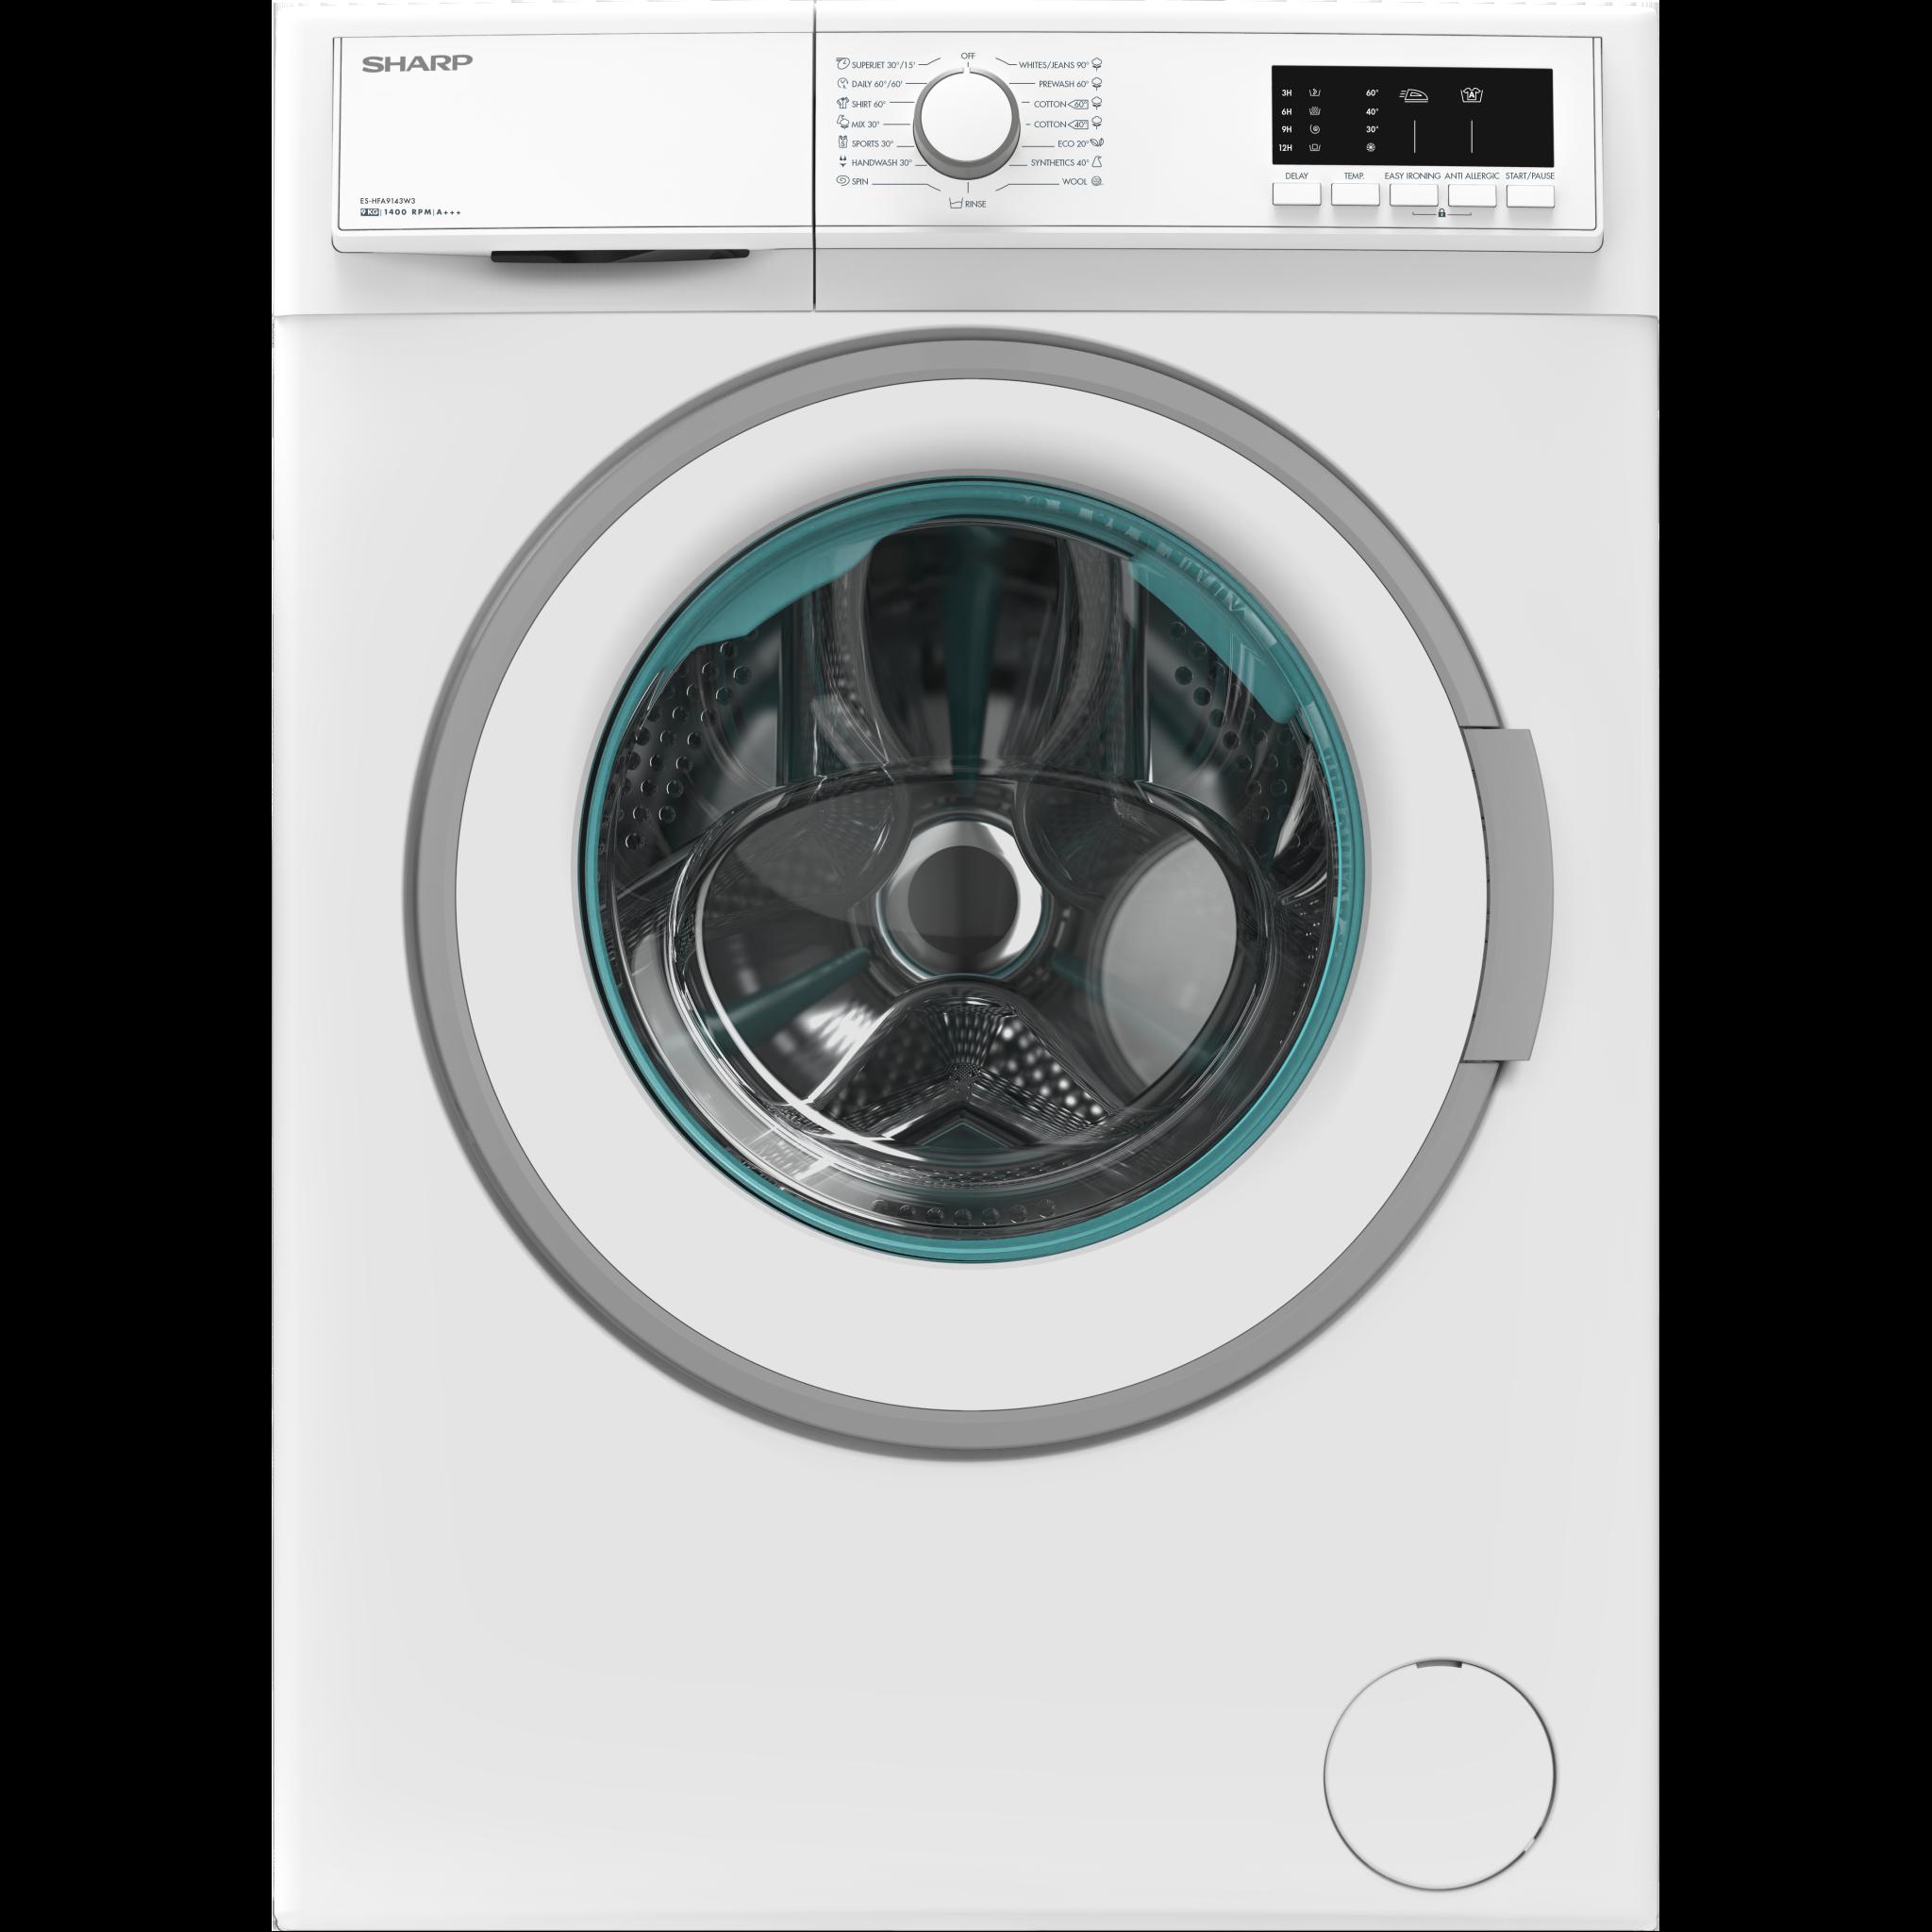 sharp washing machine available at Flamingo Qormi